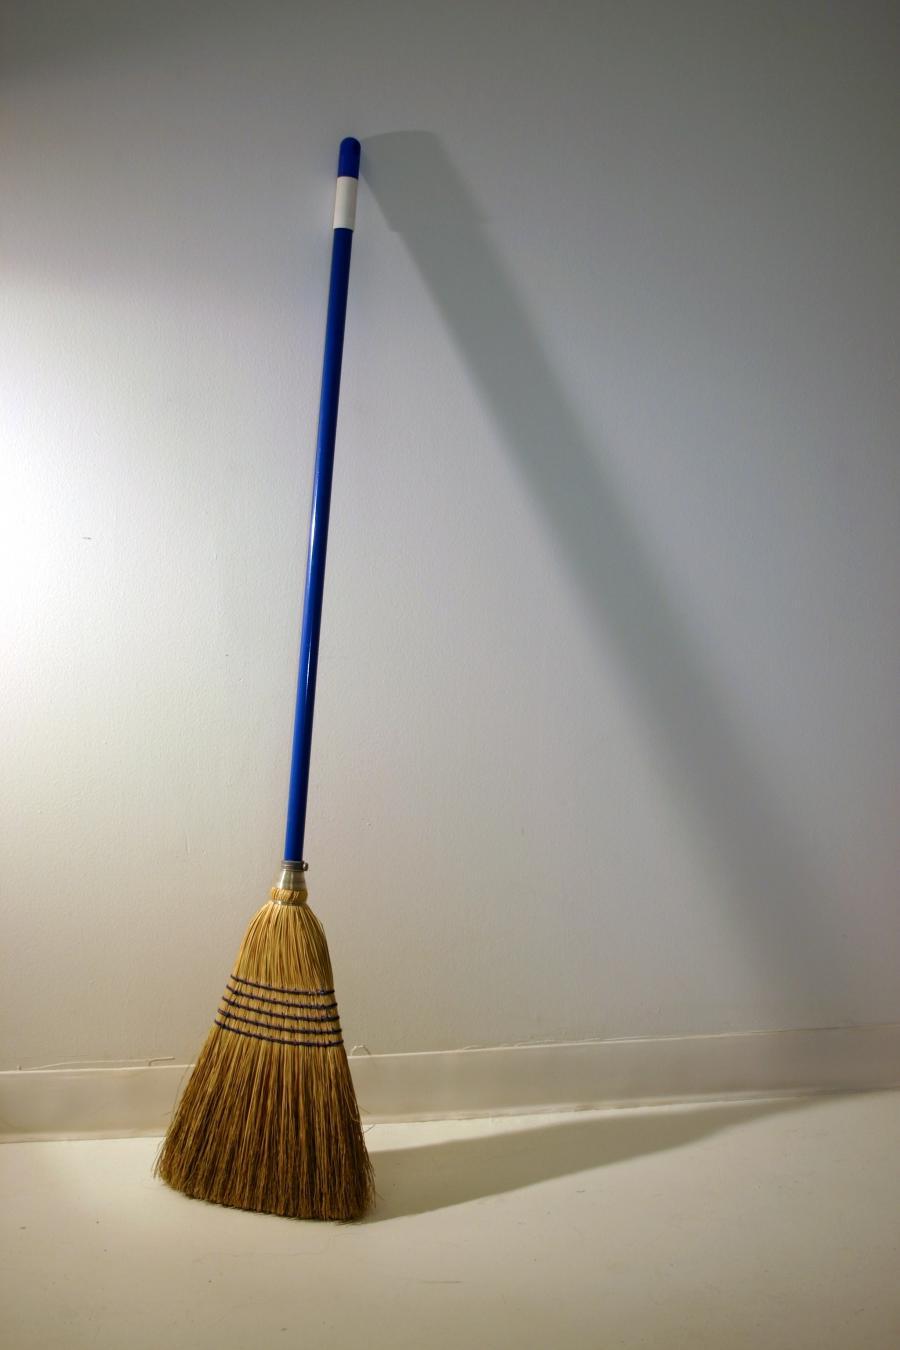 Photo Of A Broom